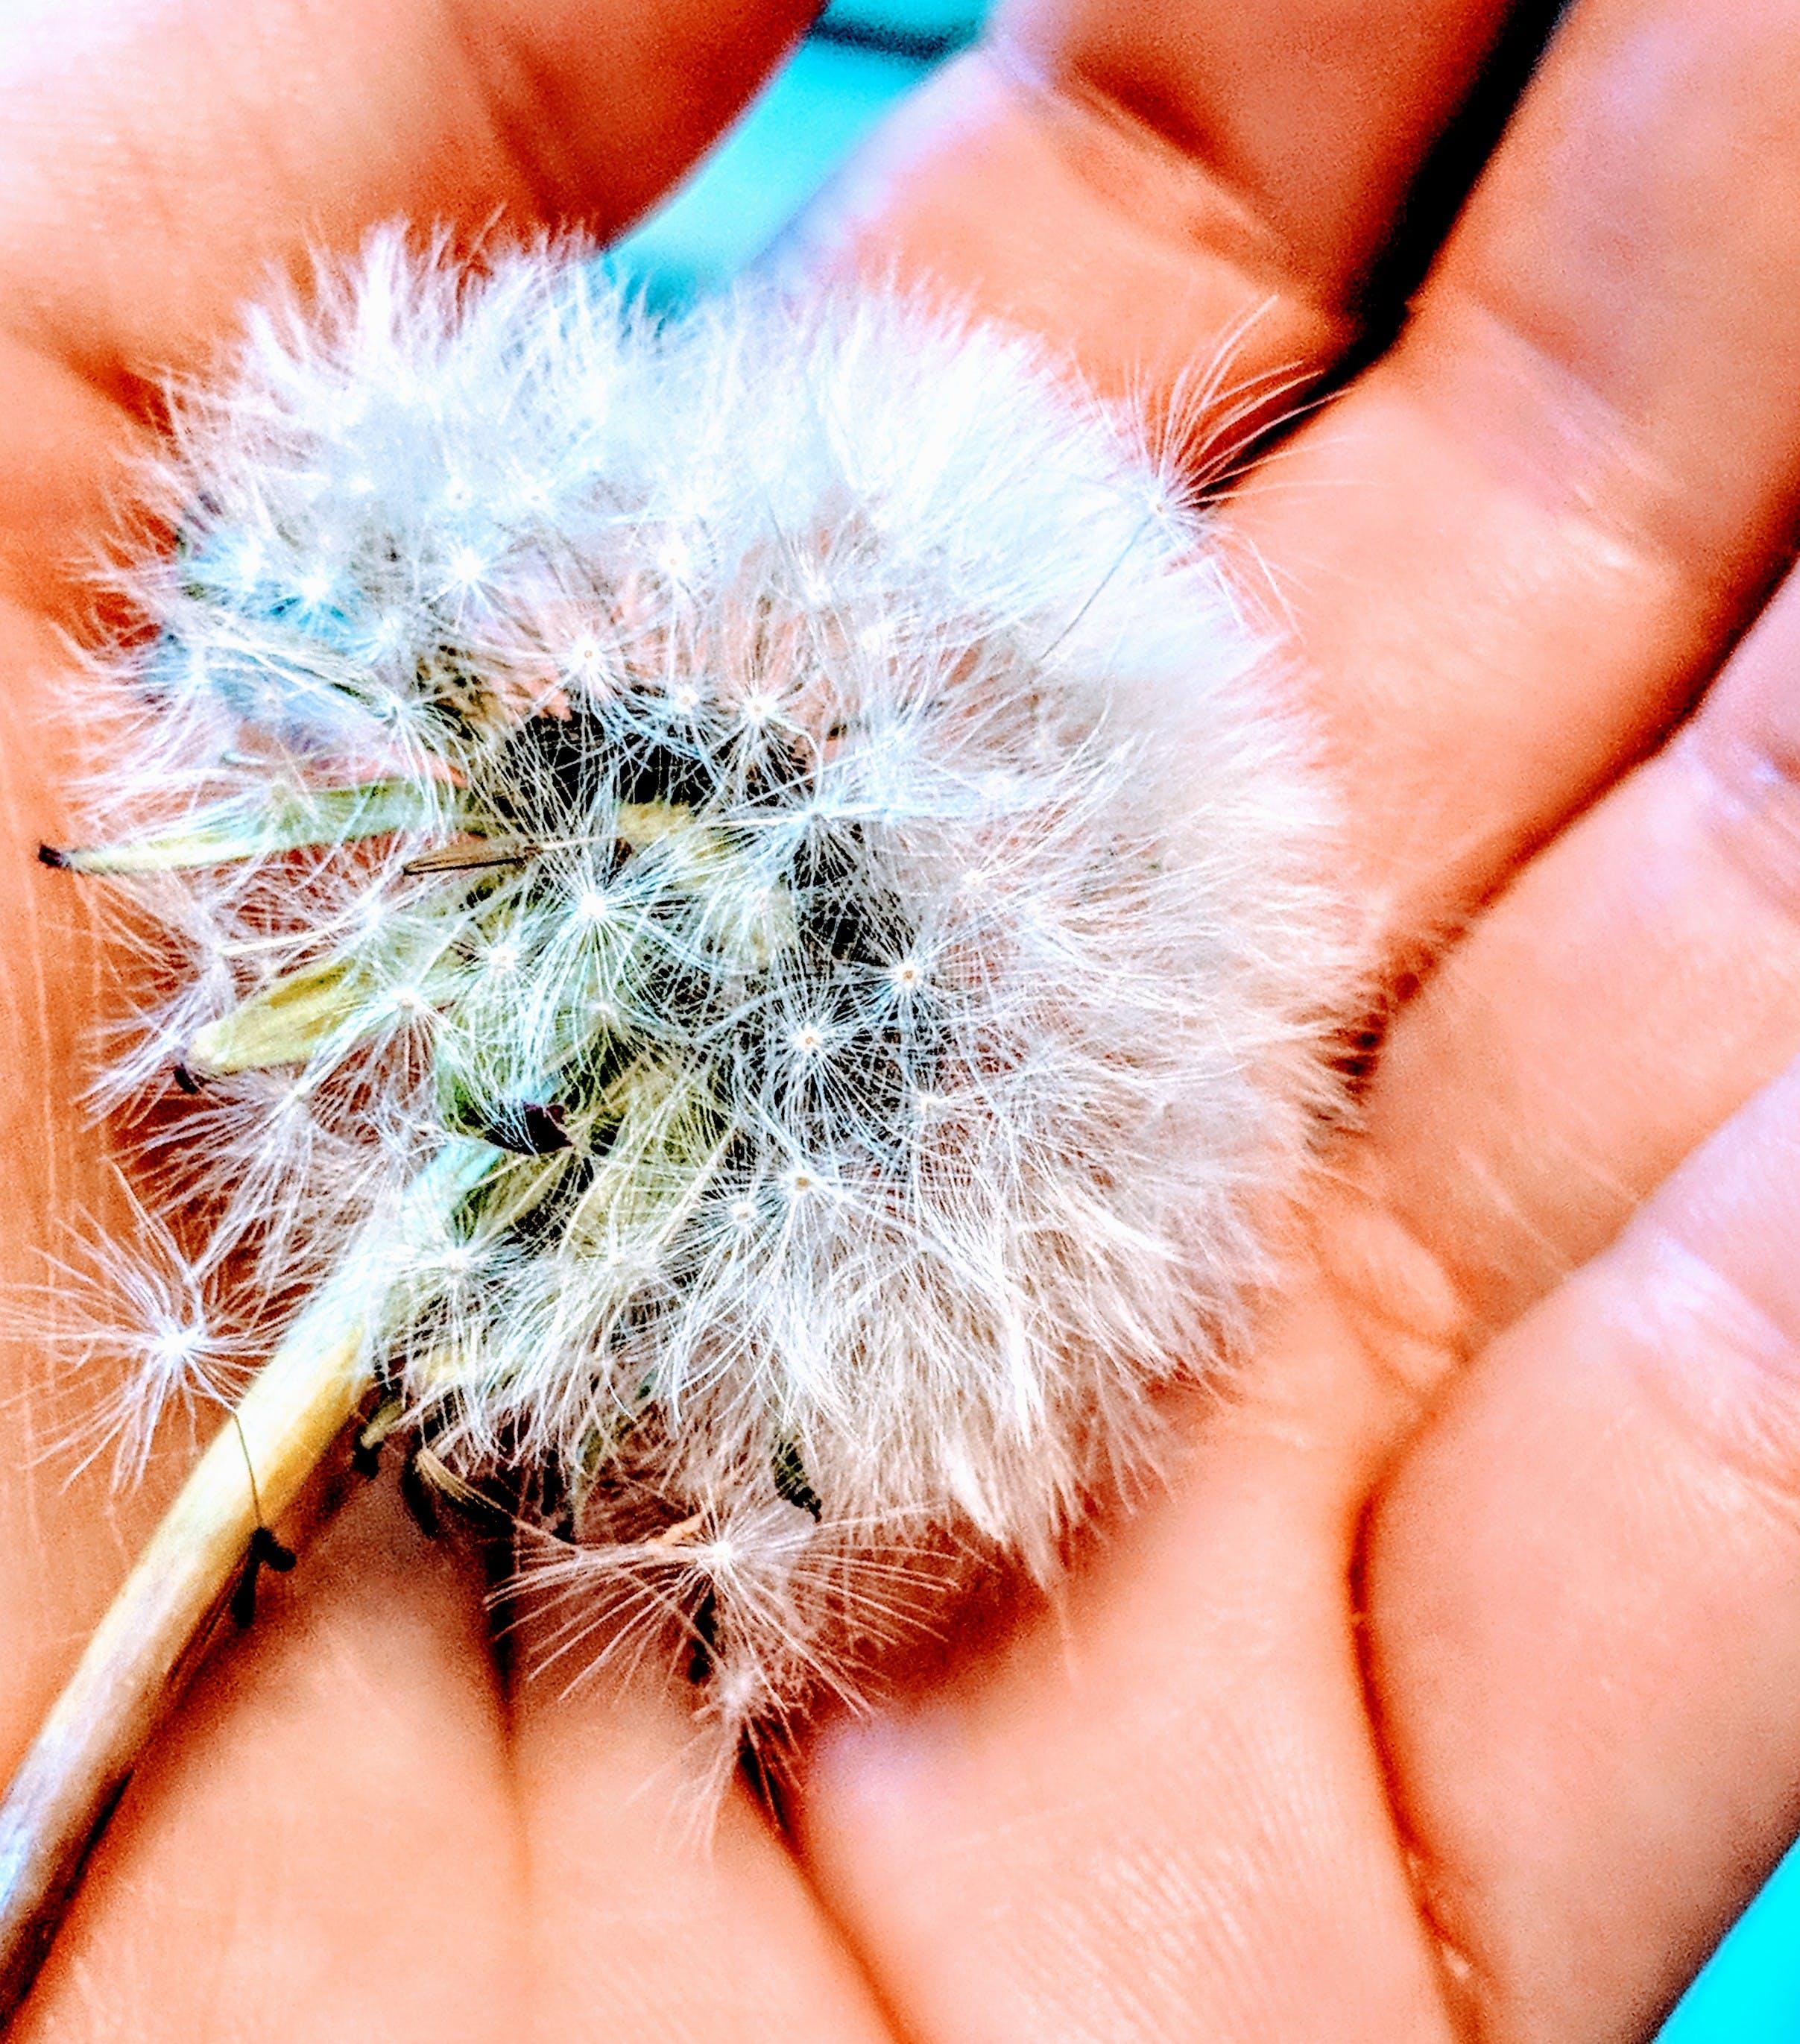 White Dandelion on Person's Hand